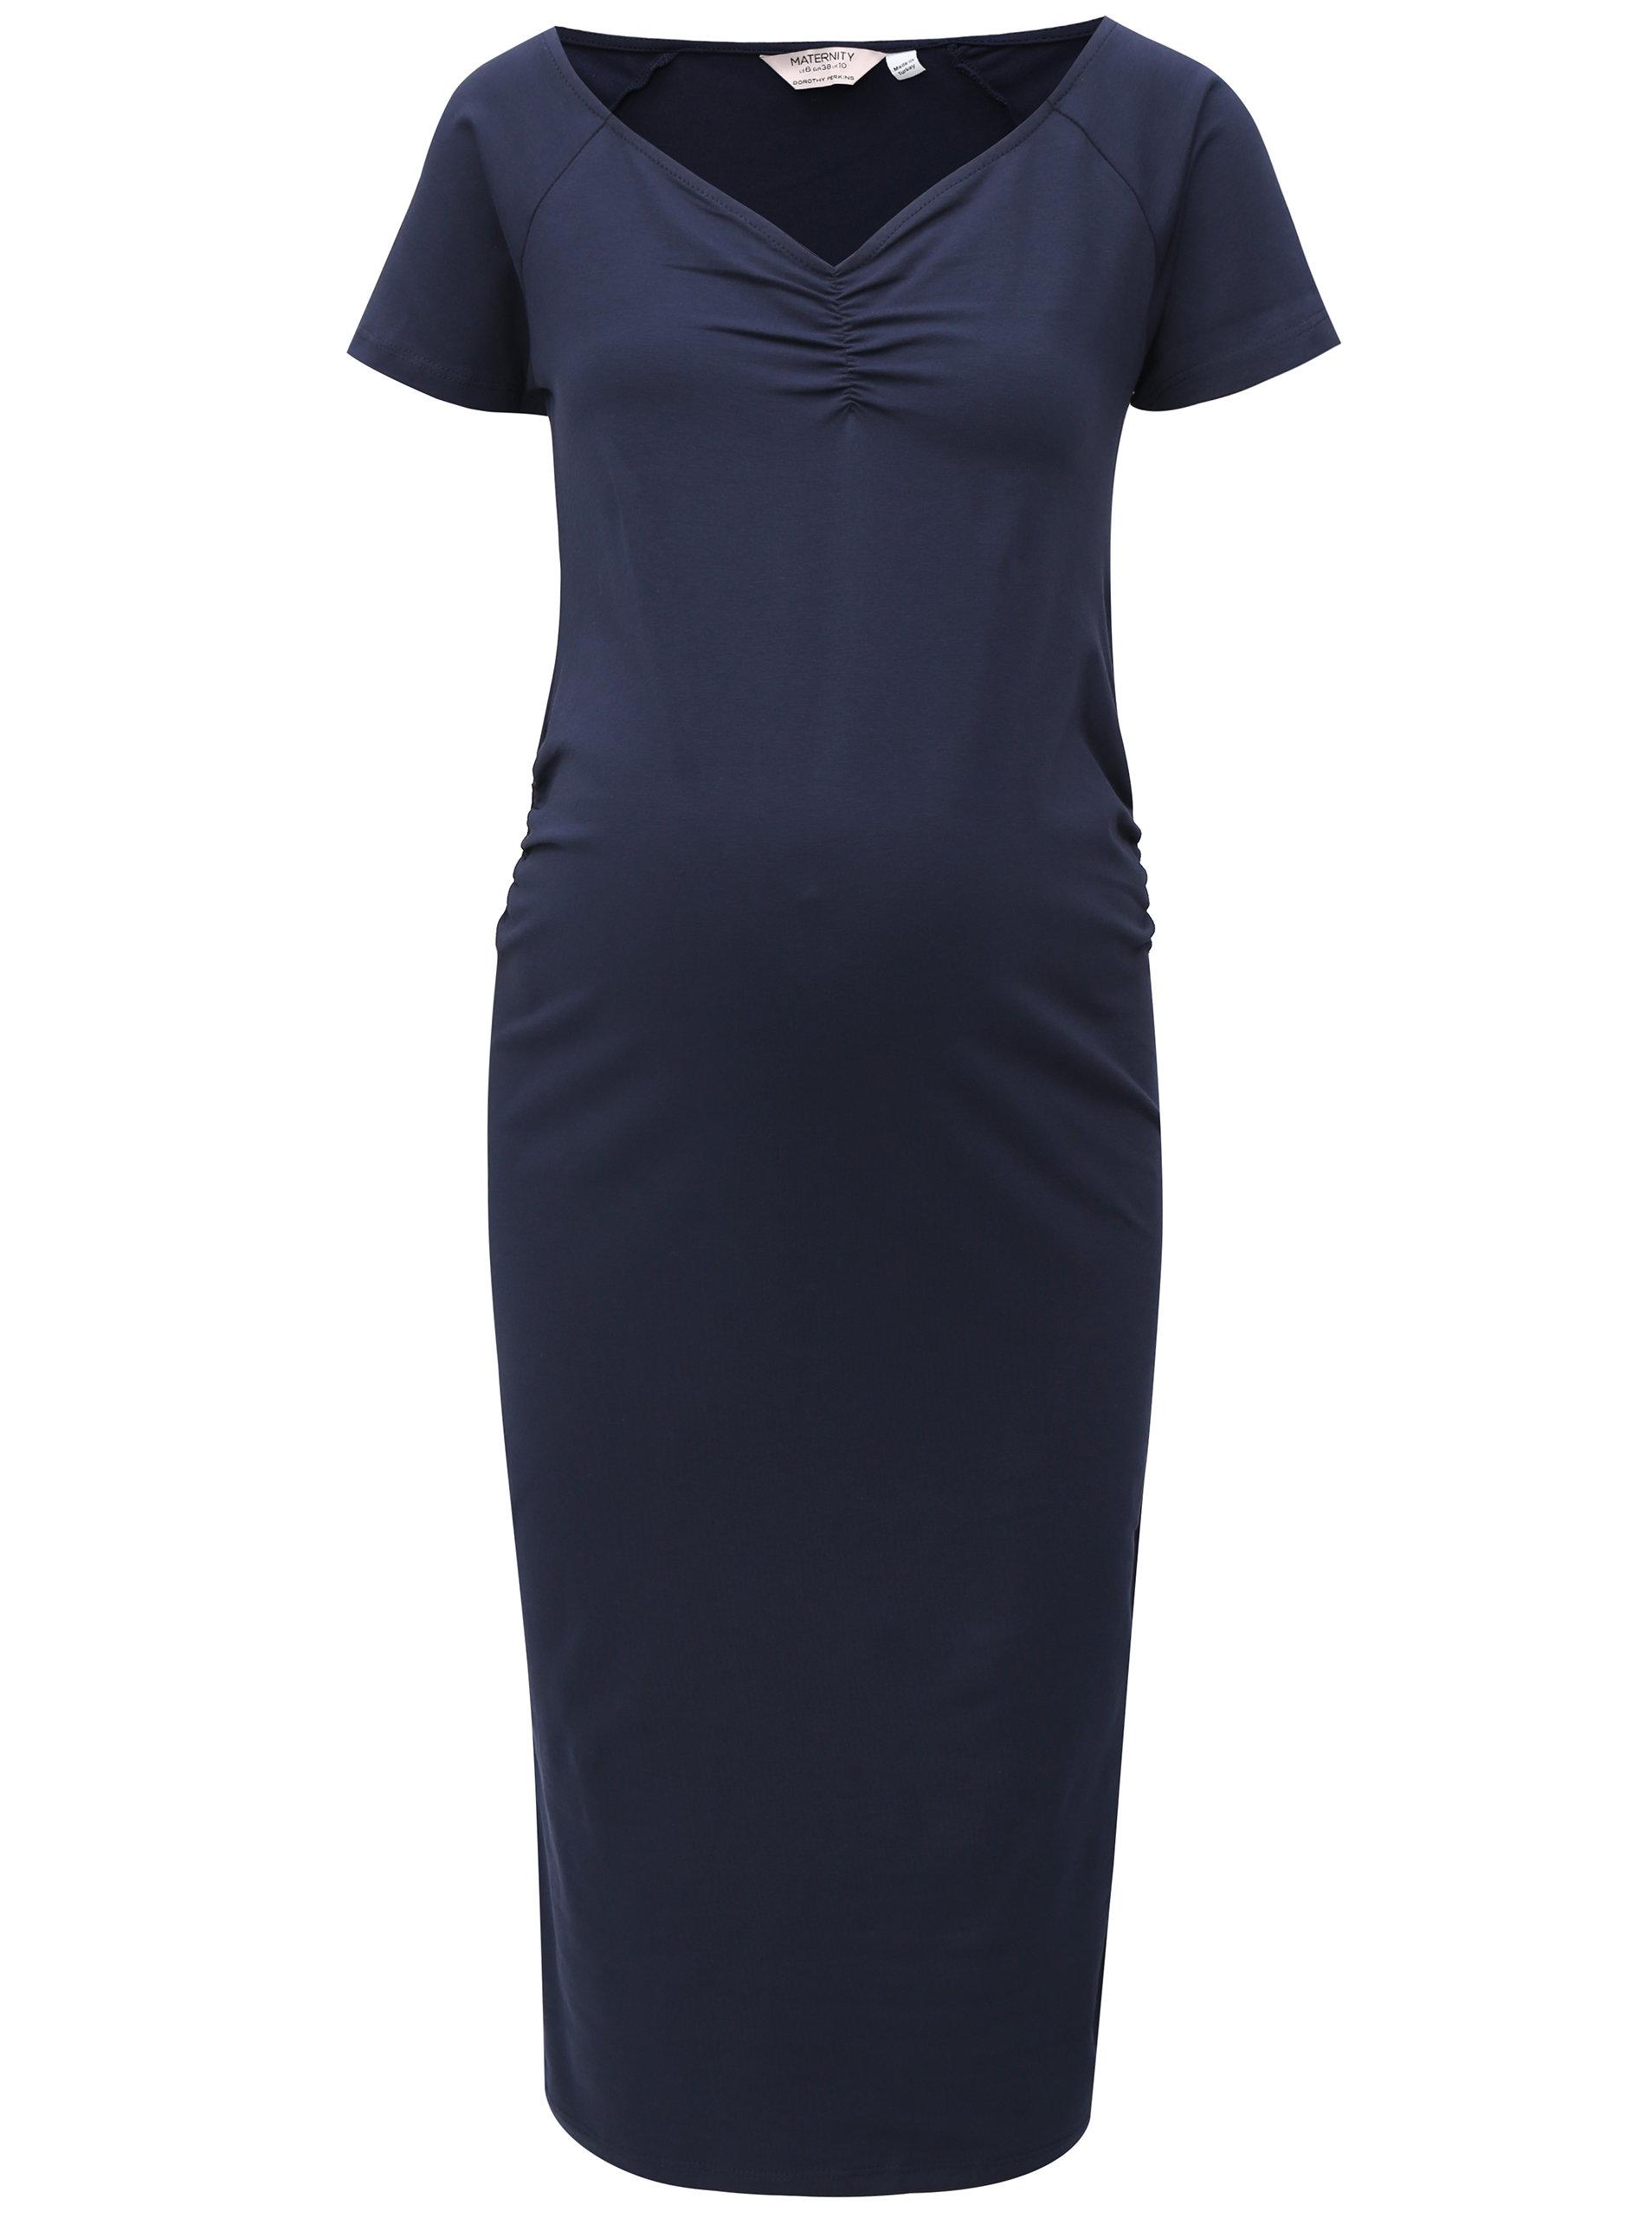 d50d9af77a2d Tmavomodré puzdrové tehotenské šaty Dorothy Perkins Maternity ...